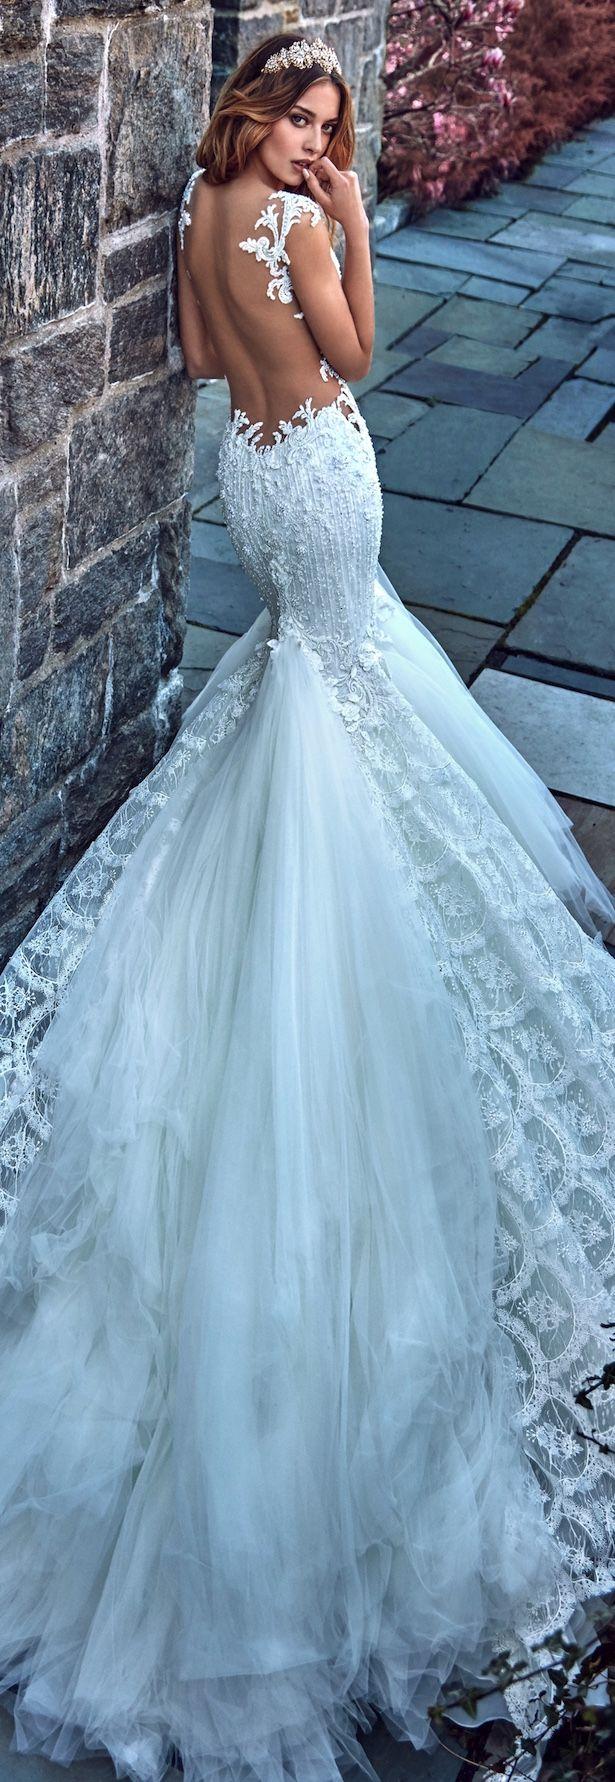 4015 best ღ♥ Wedding ♥ღ images on Pinterest | Wedding frocks ...